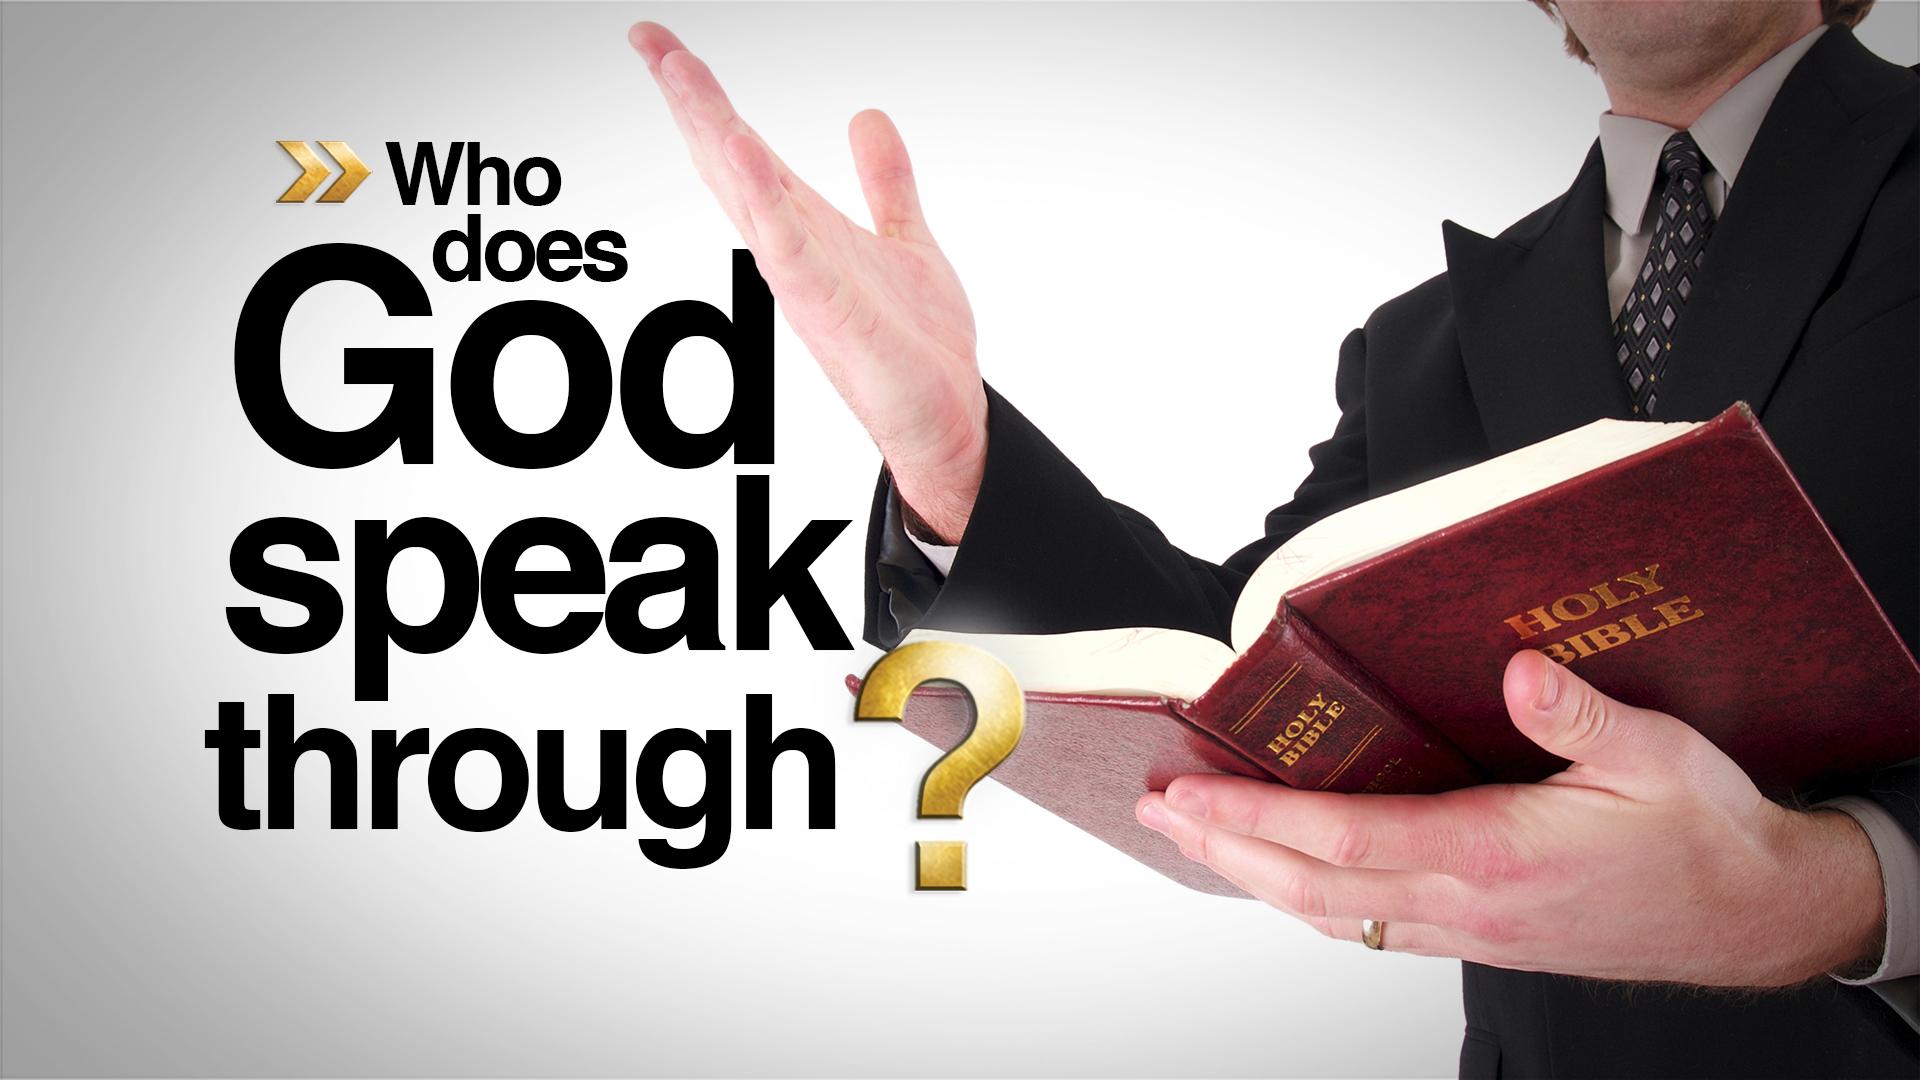 How Does God Speak to Me?